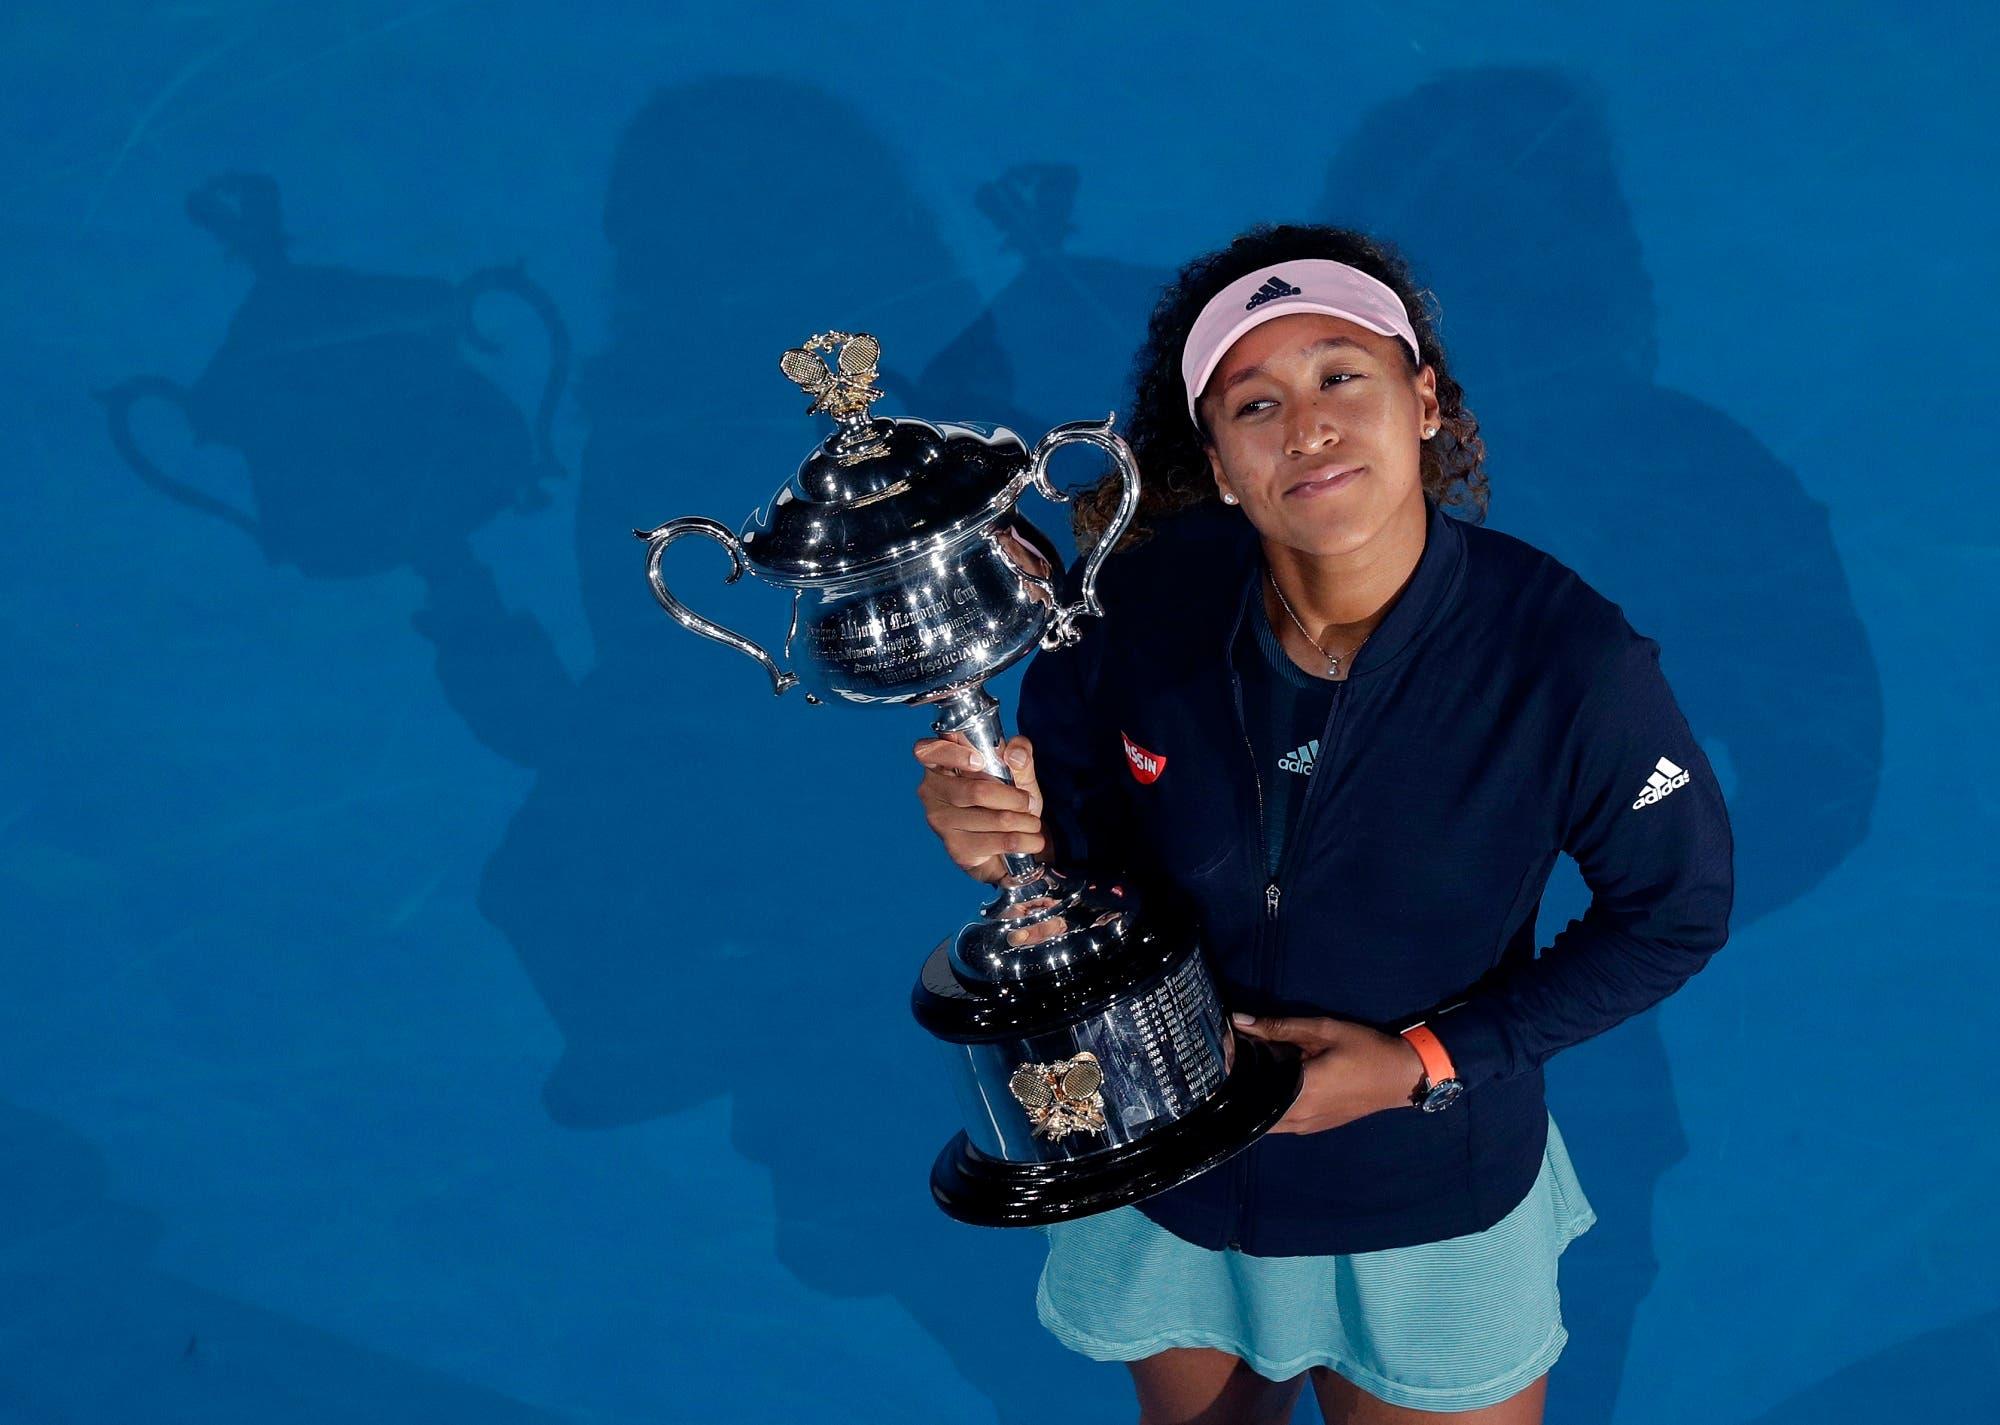 Osaka beat Petra Kvitova 7-6 (2), 5-7, 6-4 on Saturday to claim a second consecutive Grand Slam singles title. (AP)